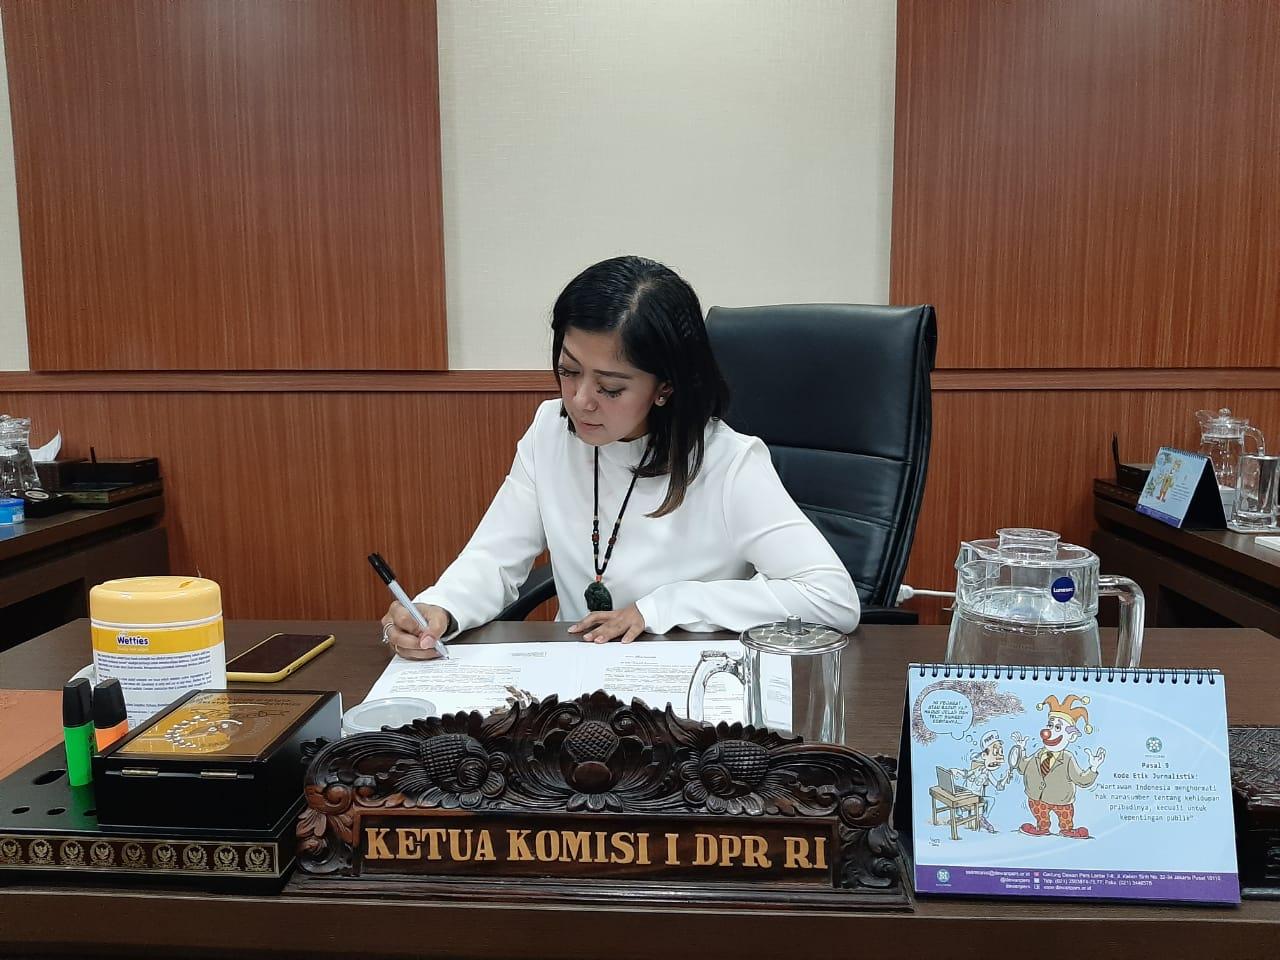 https: img-z.okeinfo.net content 2019 11 08 337 2127586 meutya-hafid-dan-perspektif-wanita-dalam-pembangunan-indonesia-pYV8Epxty4.jpg